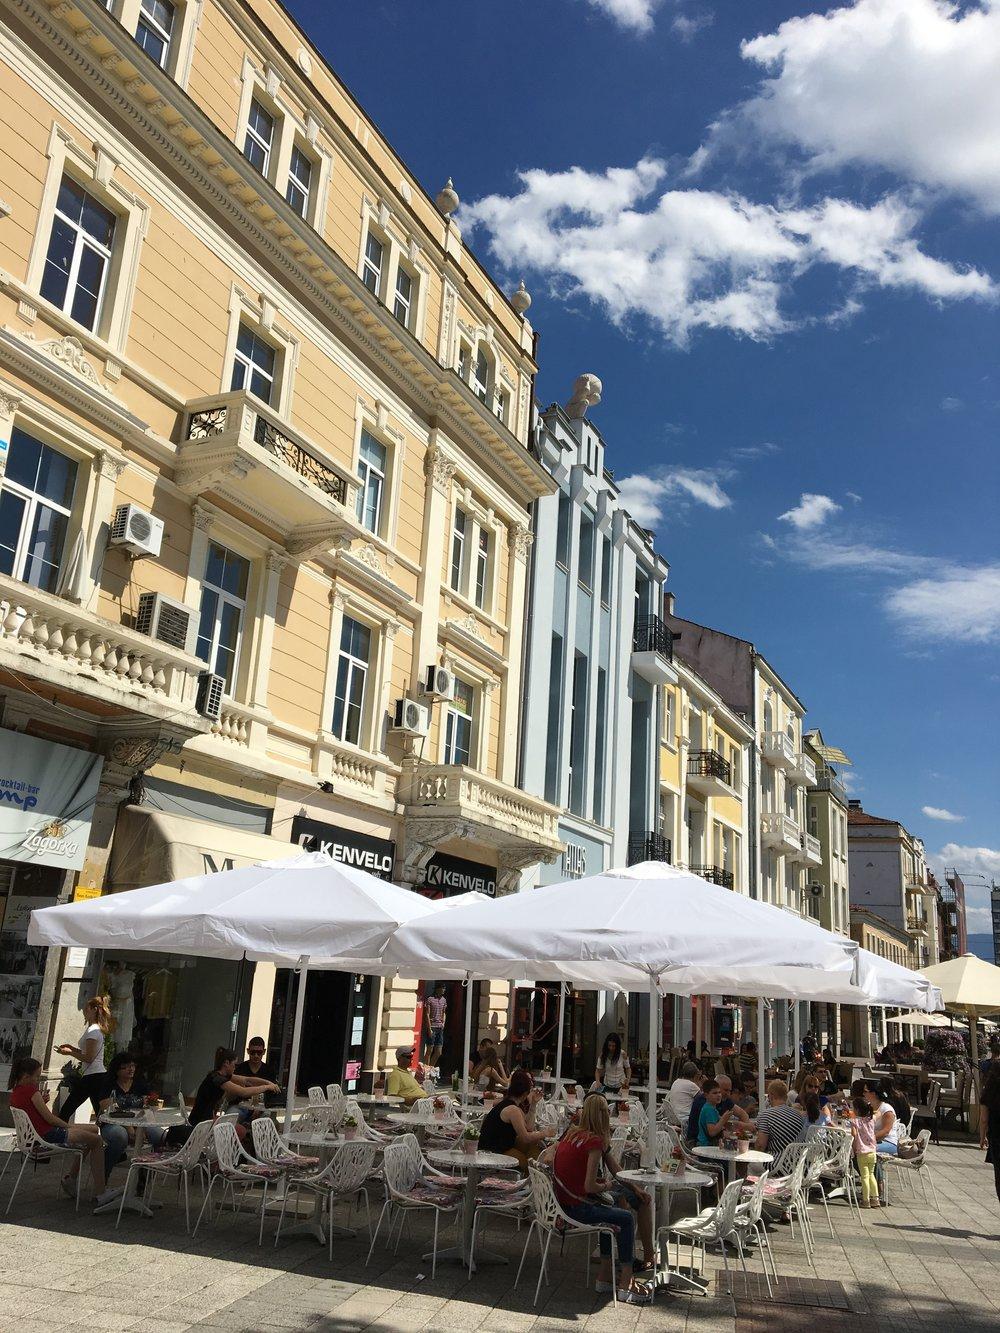 Cafes on Main Street